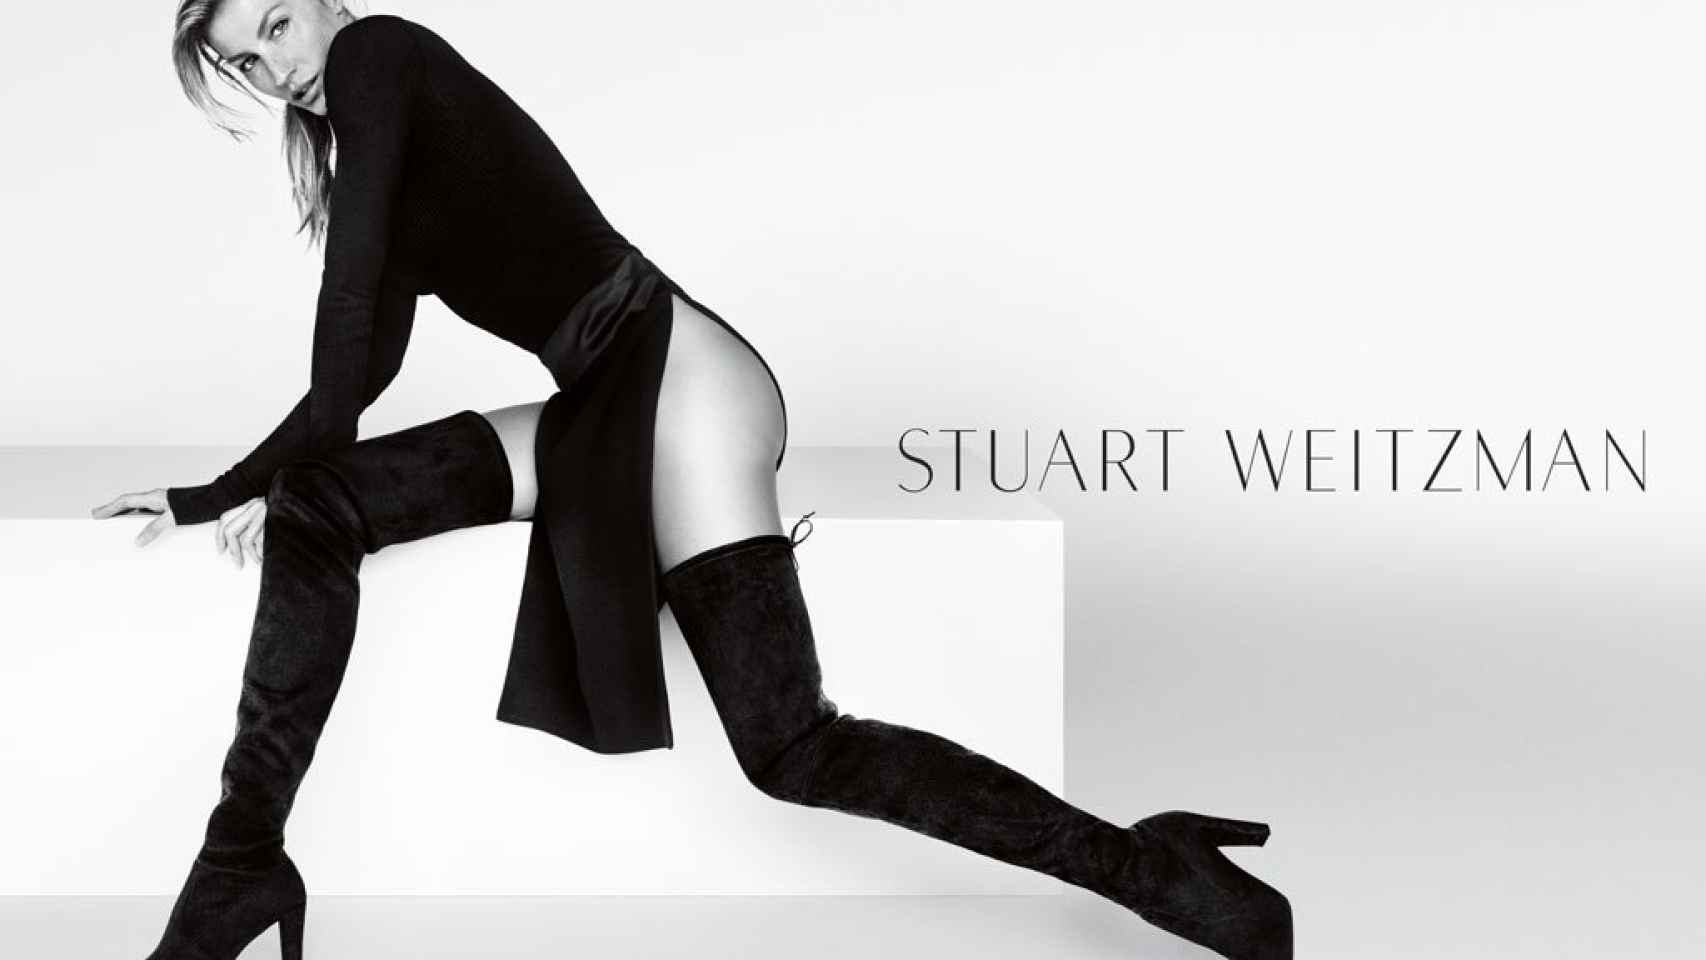 _Gisele-Bundchen-For-Stuart-Weitzman-Fall-Ad-Campaign-